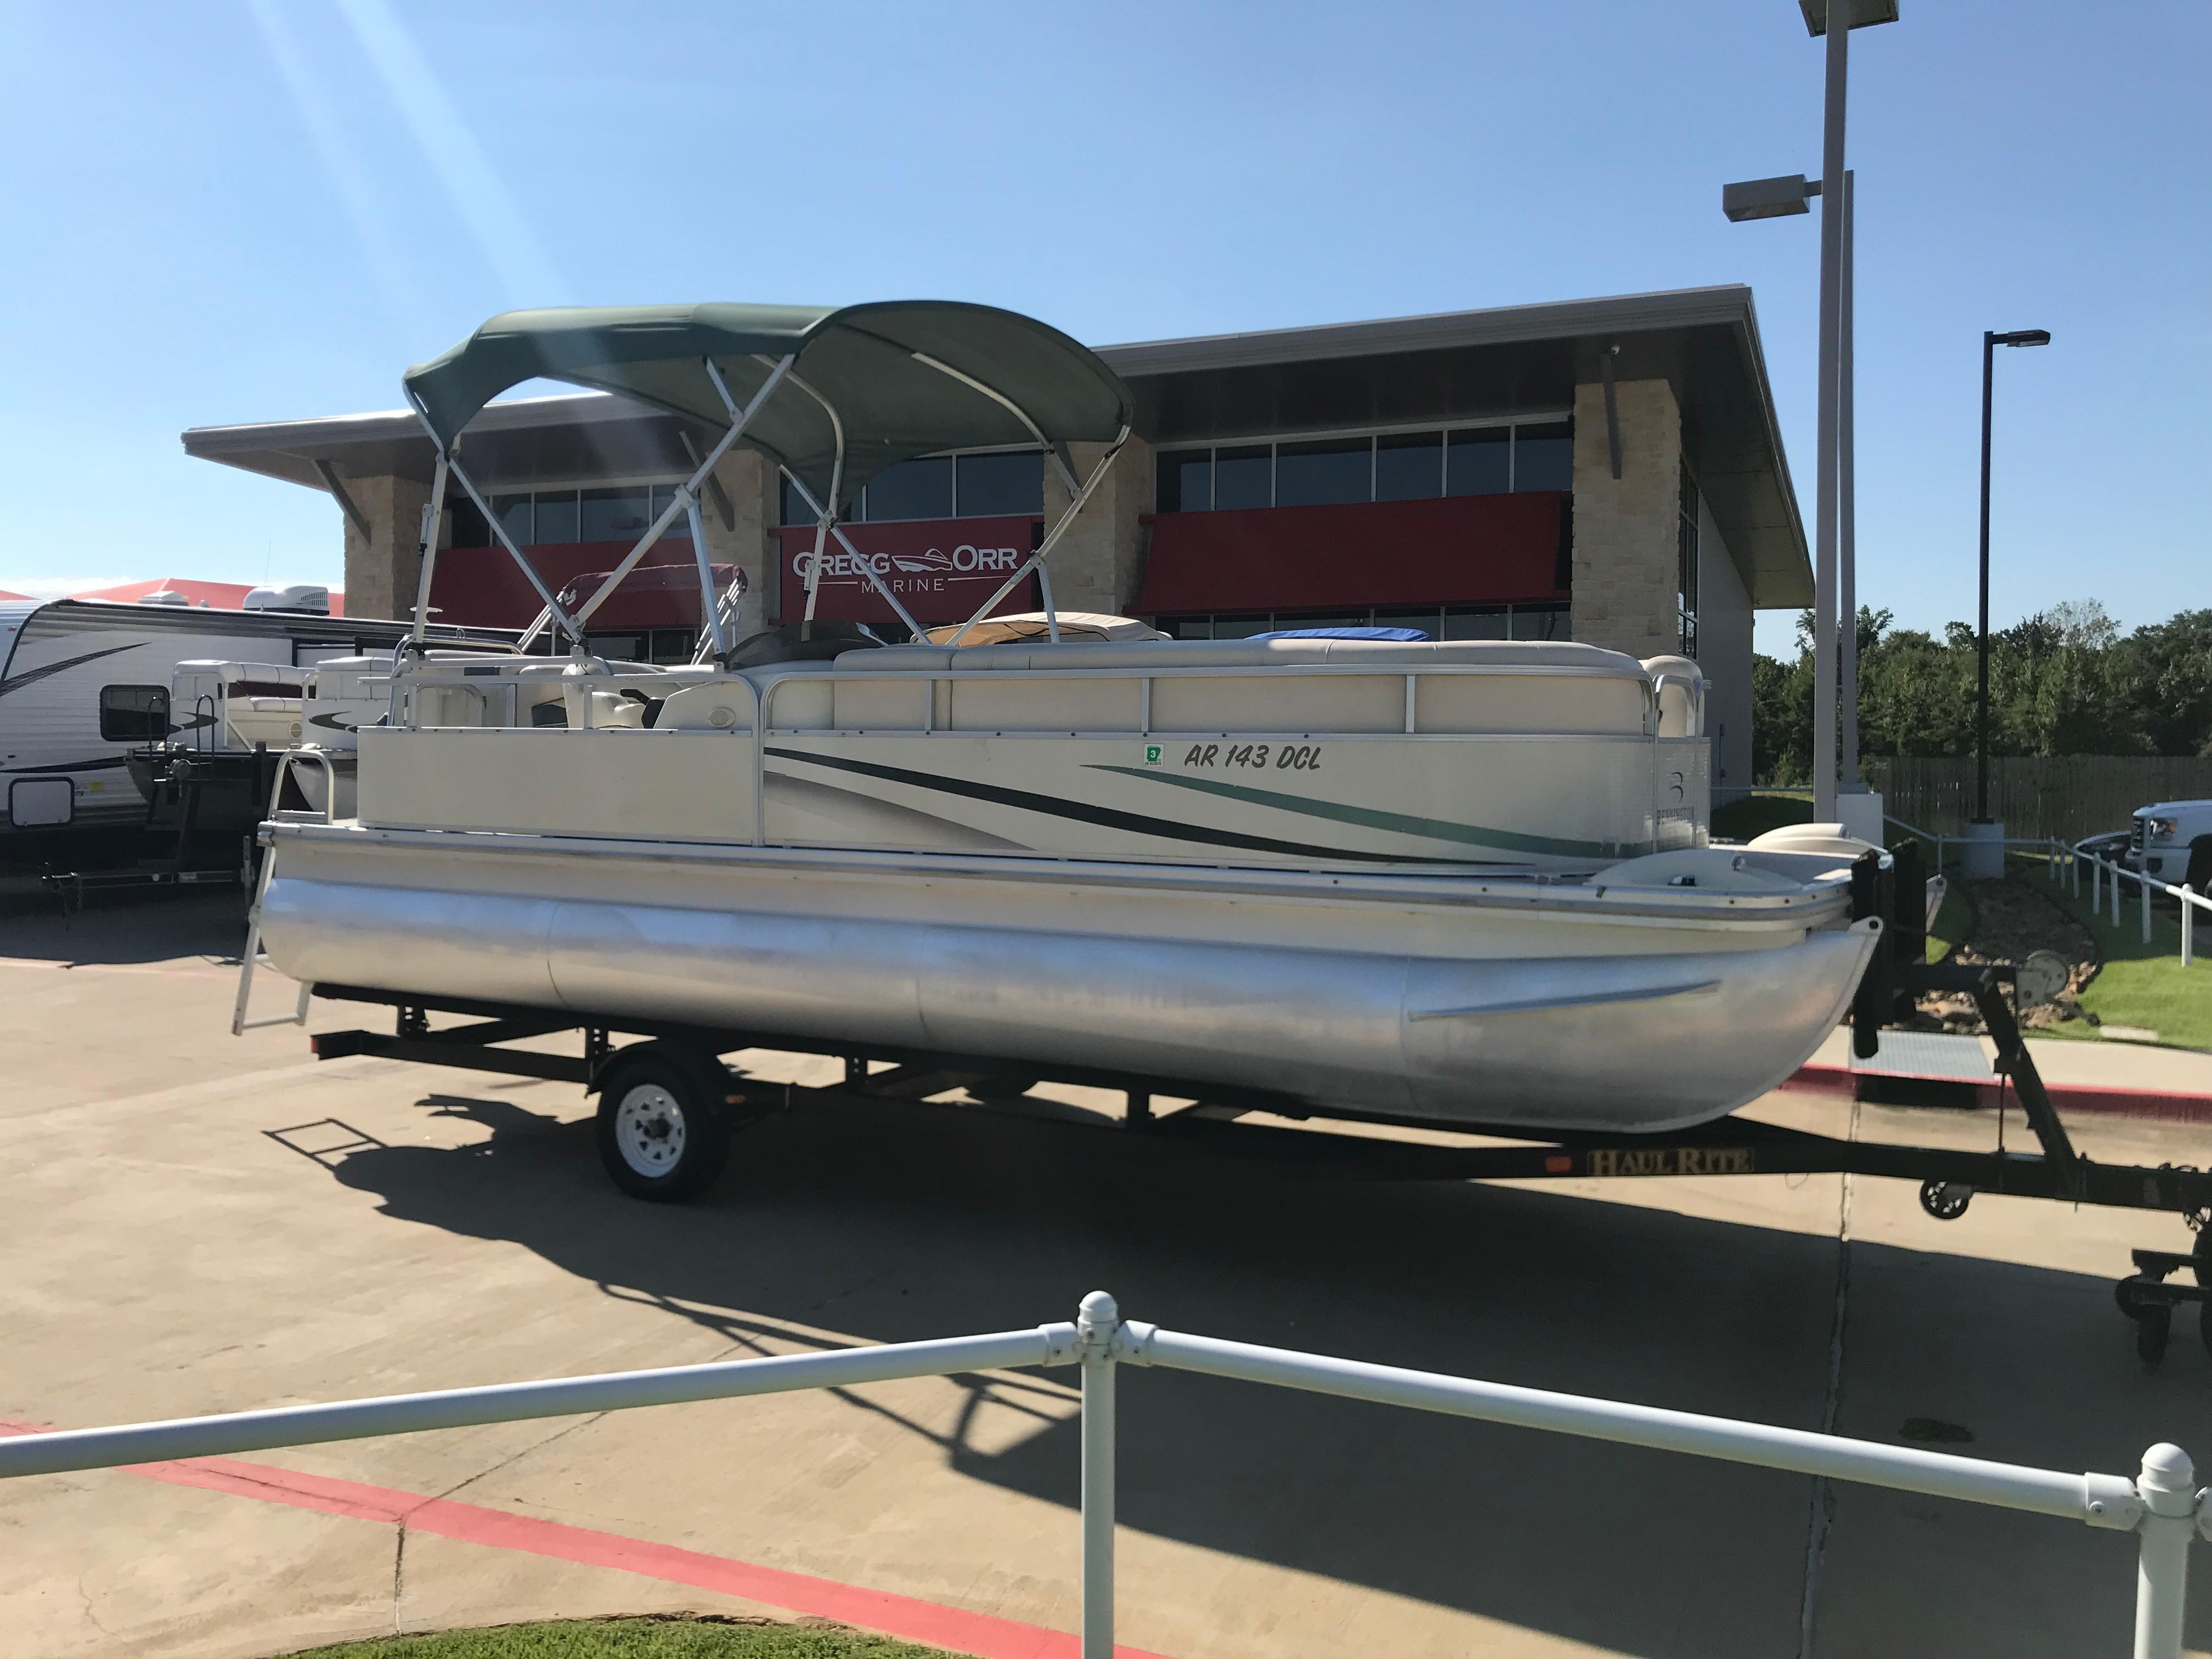 Gregg ORR Marine Texarkana Ski Boat & Pontoon Sales